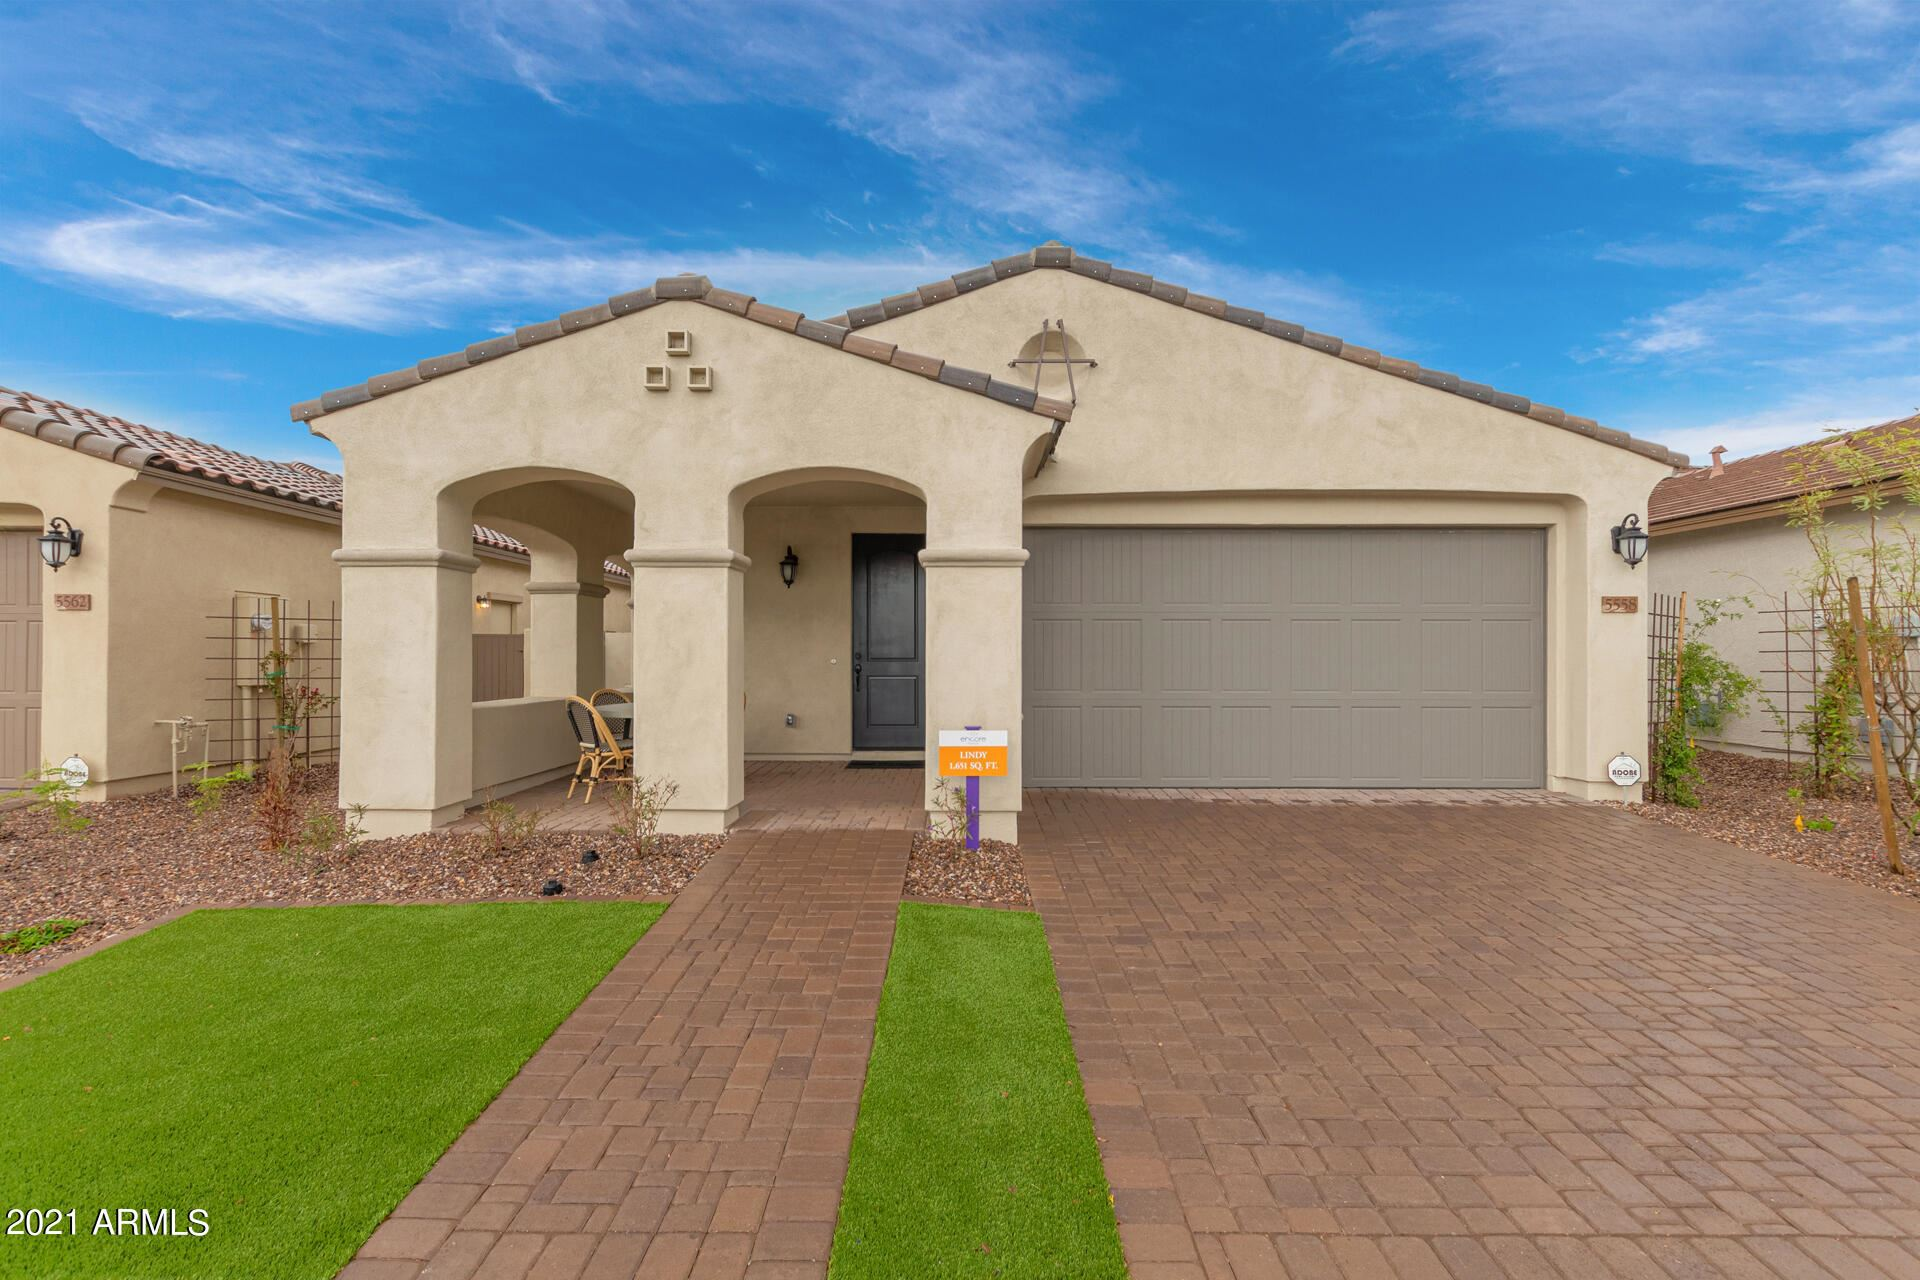 Photo of 5558 S ARCHER --, Mesa, AZ 85212 (MLS # 6295990)